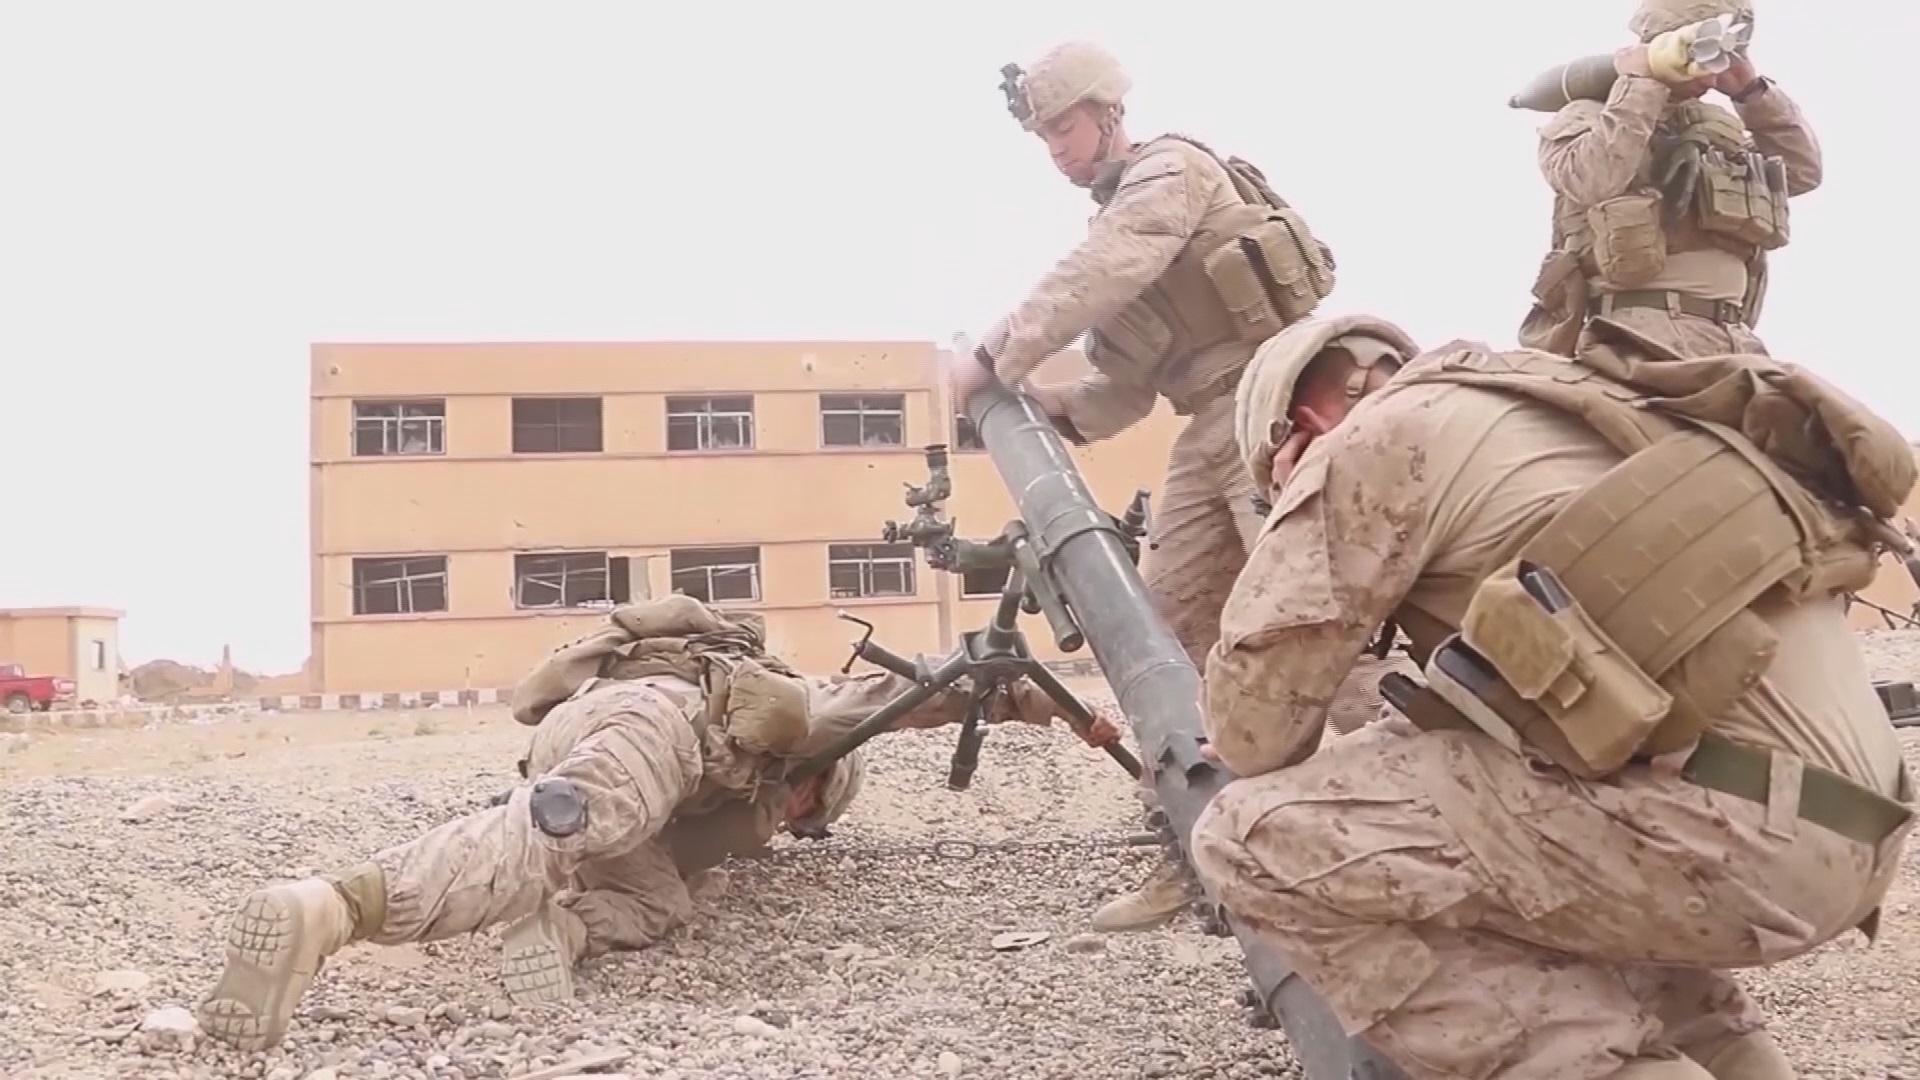 military_1547209006885.jpg